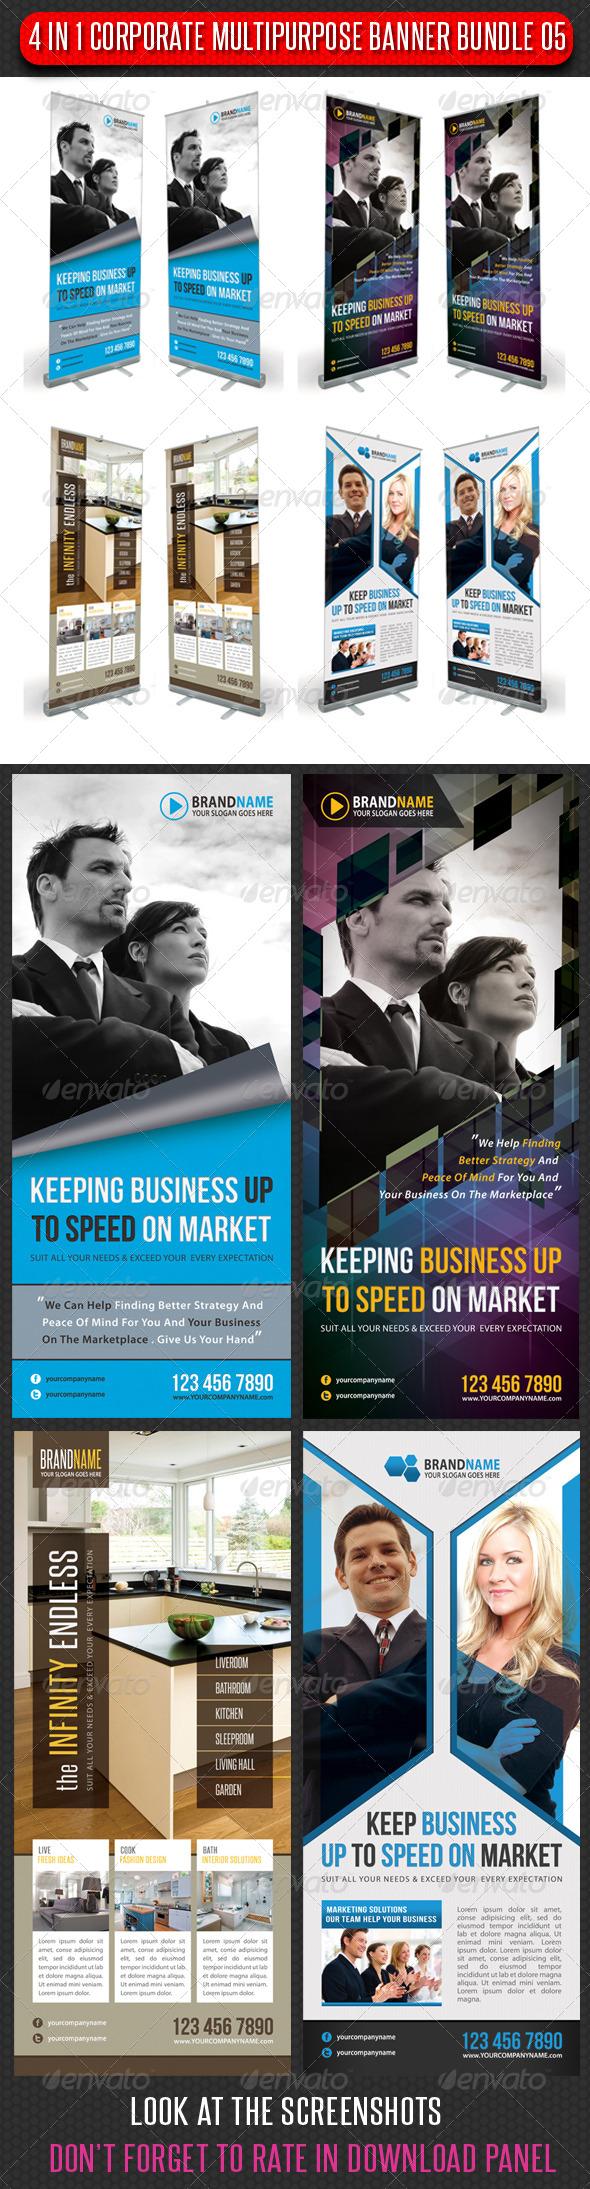 GraphicRiver 4 in 1 Corporate Multipurpose Banner Bundle 05 6465836